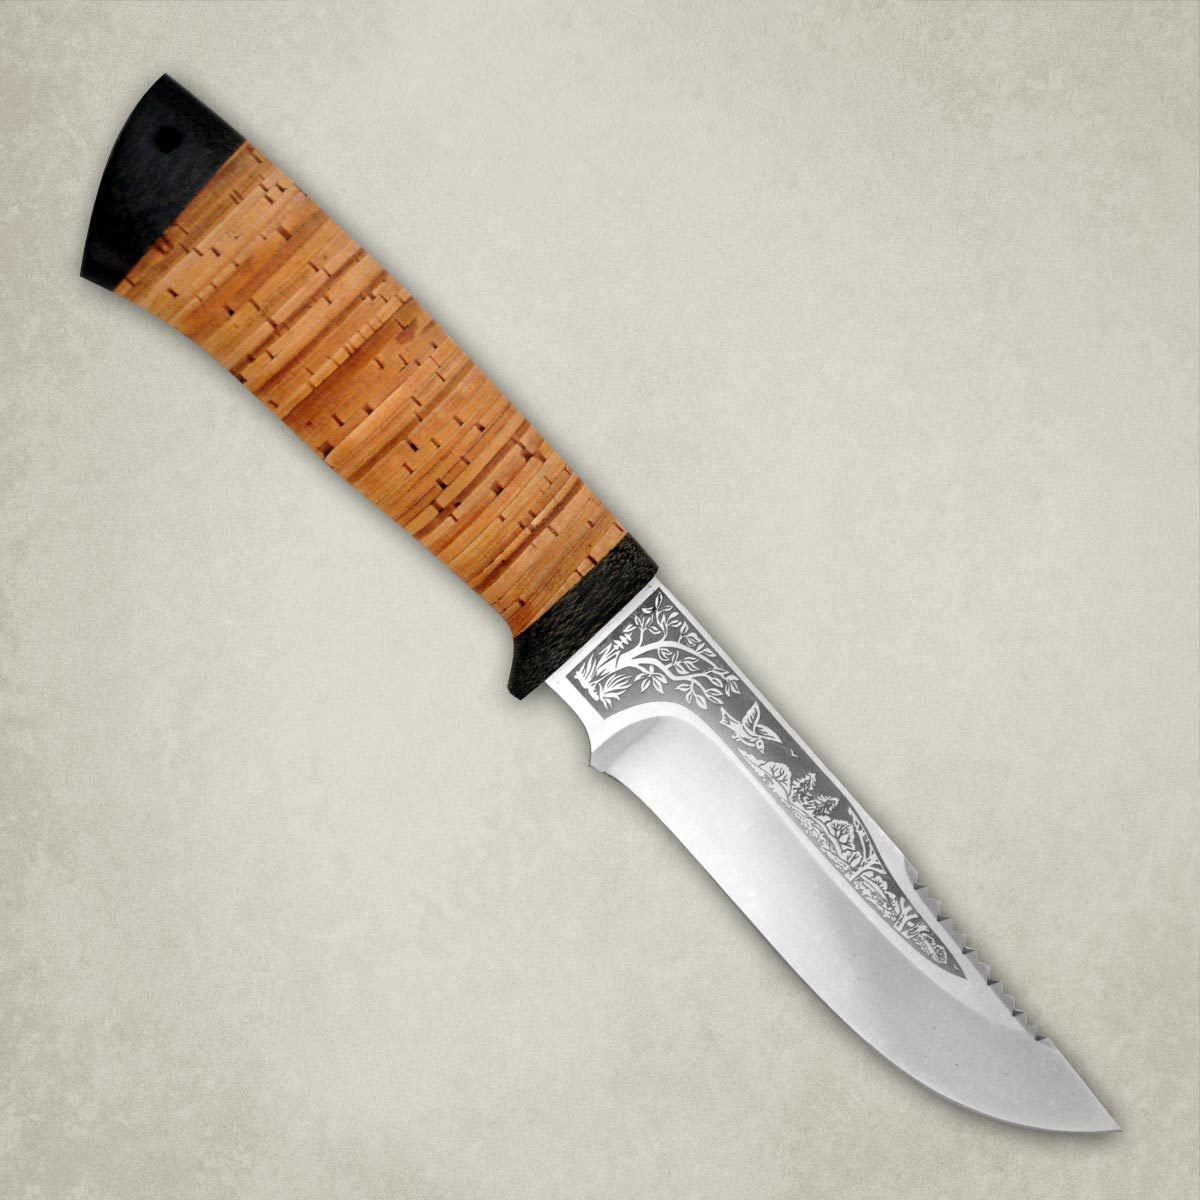 Нож АиР Стрелец, сталь ЭП-766, рукоять береста недорого